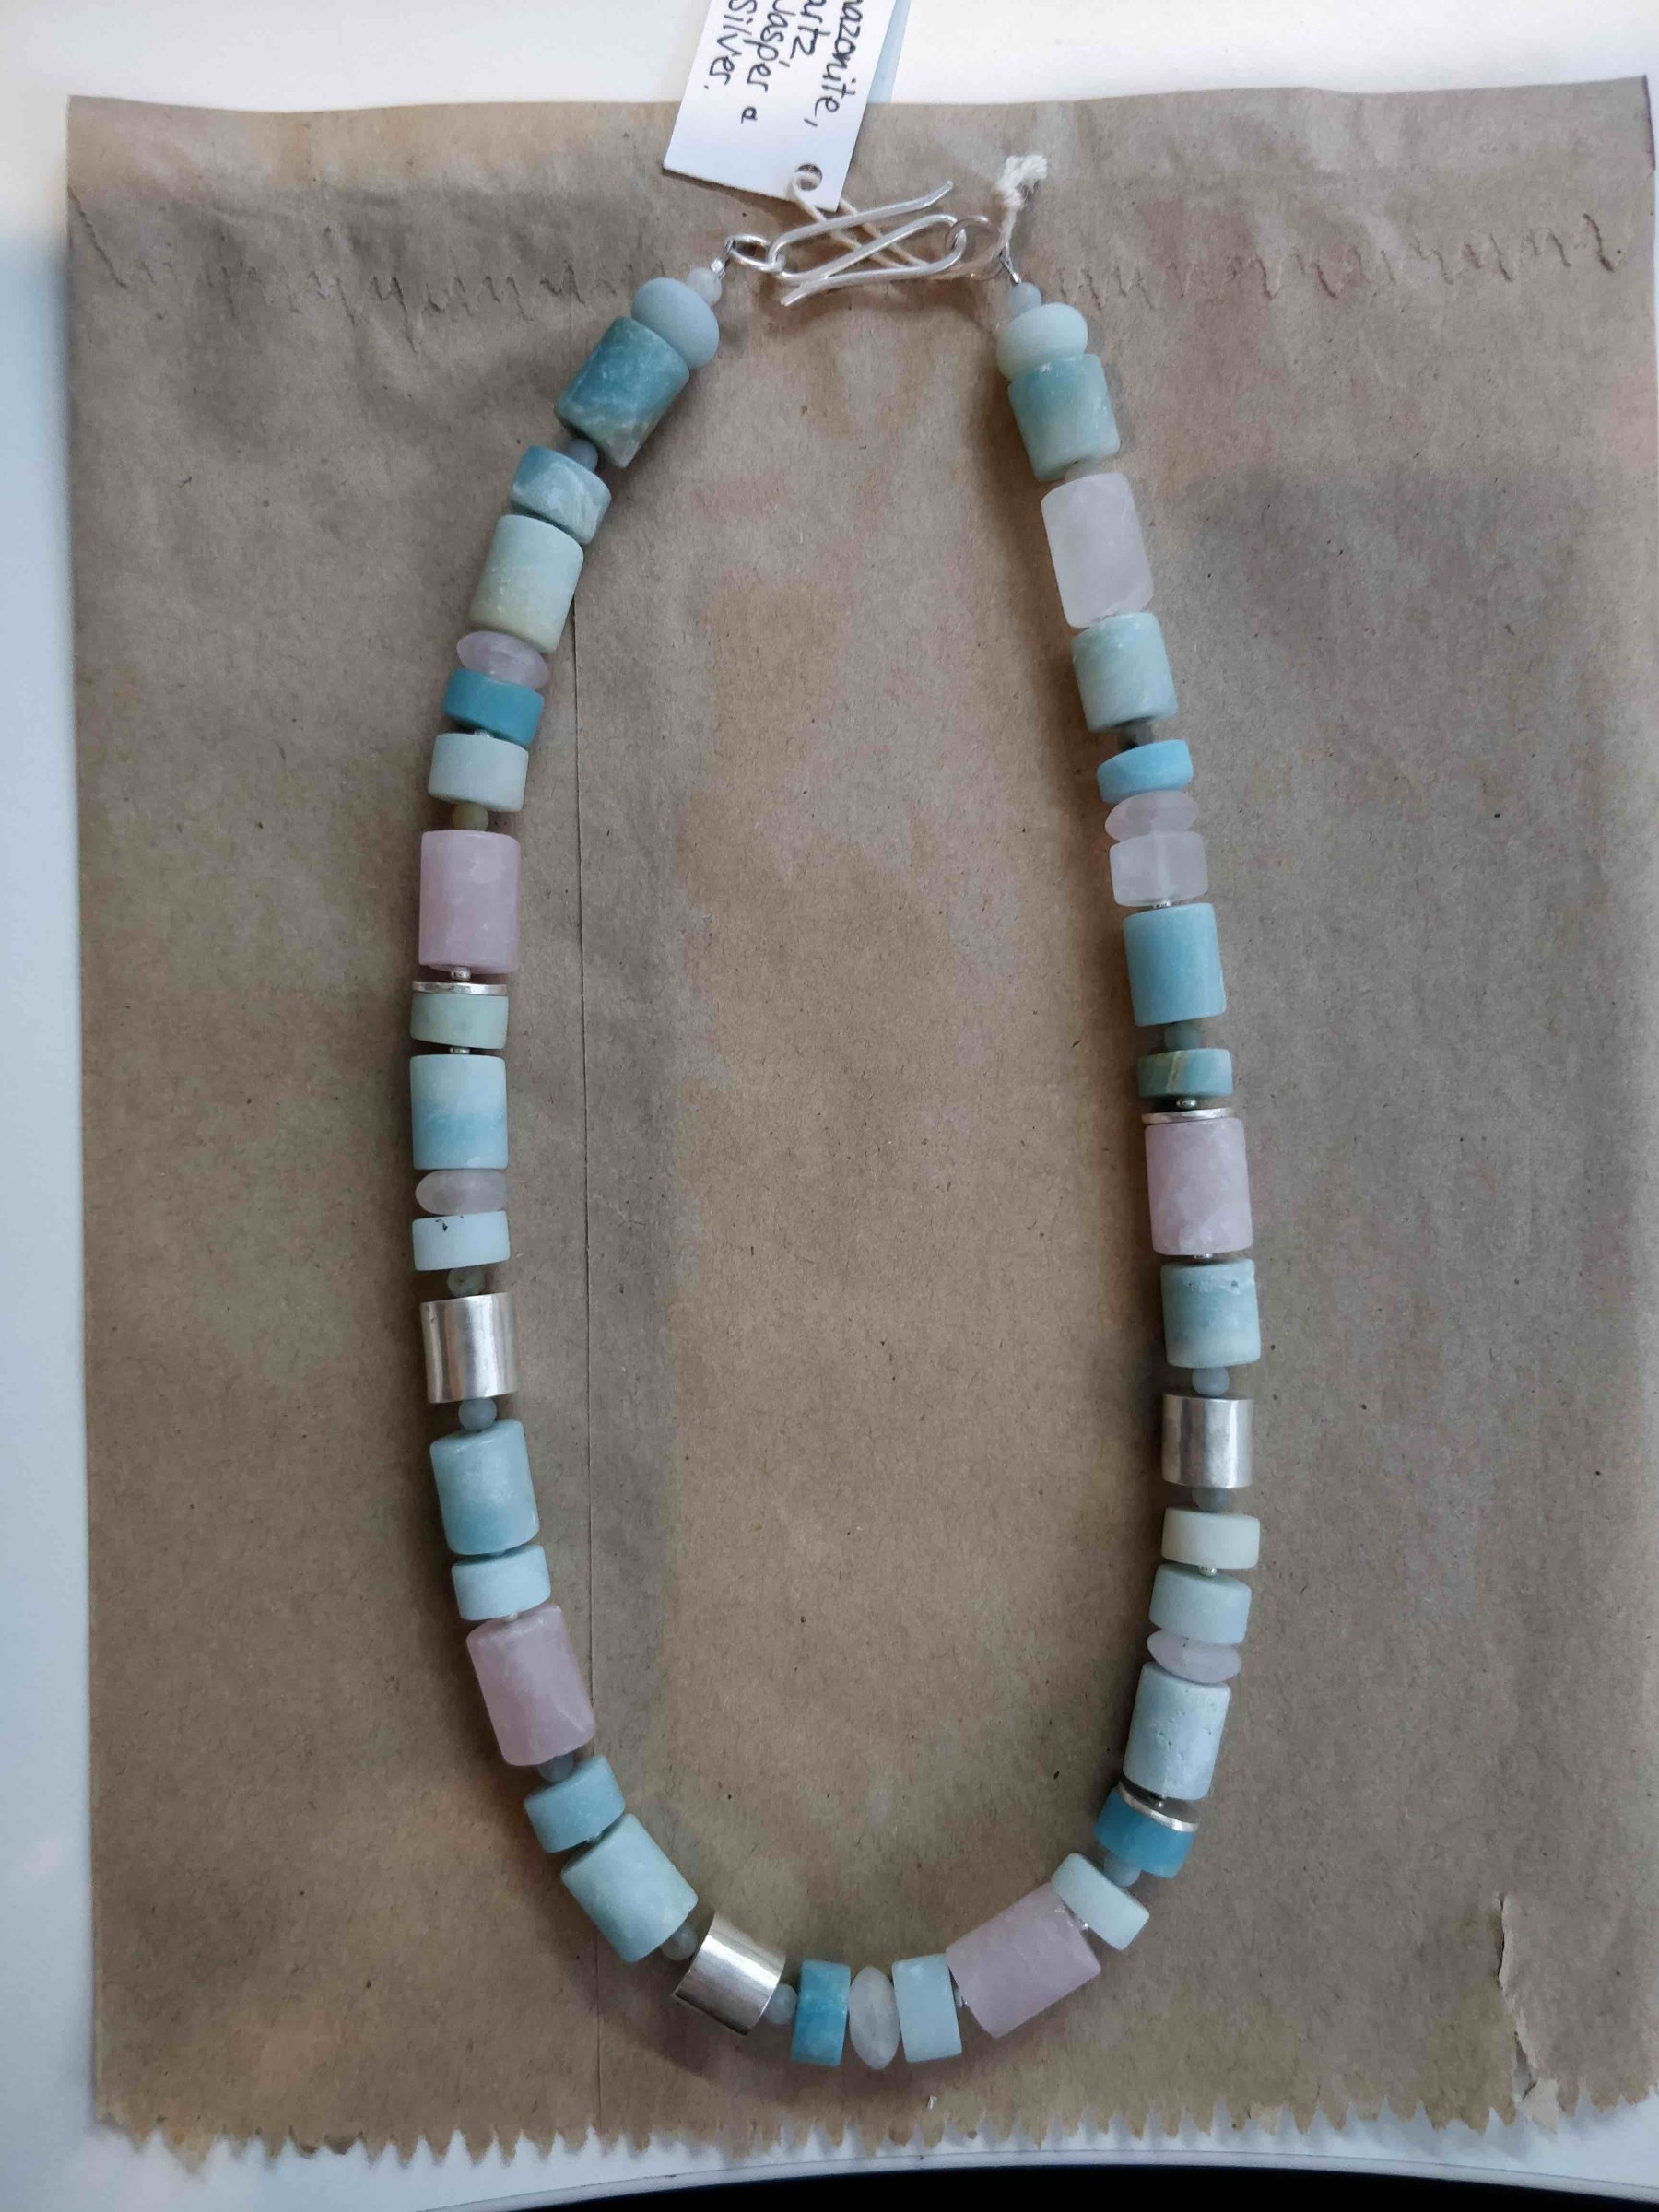 <span class=&#34;link fancybox-details-link&#34;><a href=&#34;/artists/148-roberta-hopkins/works/5701-roberta-hopkins-black-amazonite-rose-quartz-tubes-2018/&#34;>View Detail Page</a></span><div class=&#34;artist&#34;><strong>Roberta Hopkins</strong></div> <div class=&#34;title&#34;><em>Black Amazonite/Rose Quartz tubes</em>, 2018</div> <div class=&#34;medium&#34;>sterling silver</div><div class=&#34;price&#34;>£190.00</div><div class=&#34;copyright_line&#34;>£ 19 x 10 Months, OwnArt 0% APR</div>